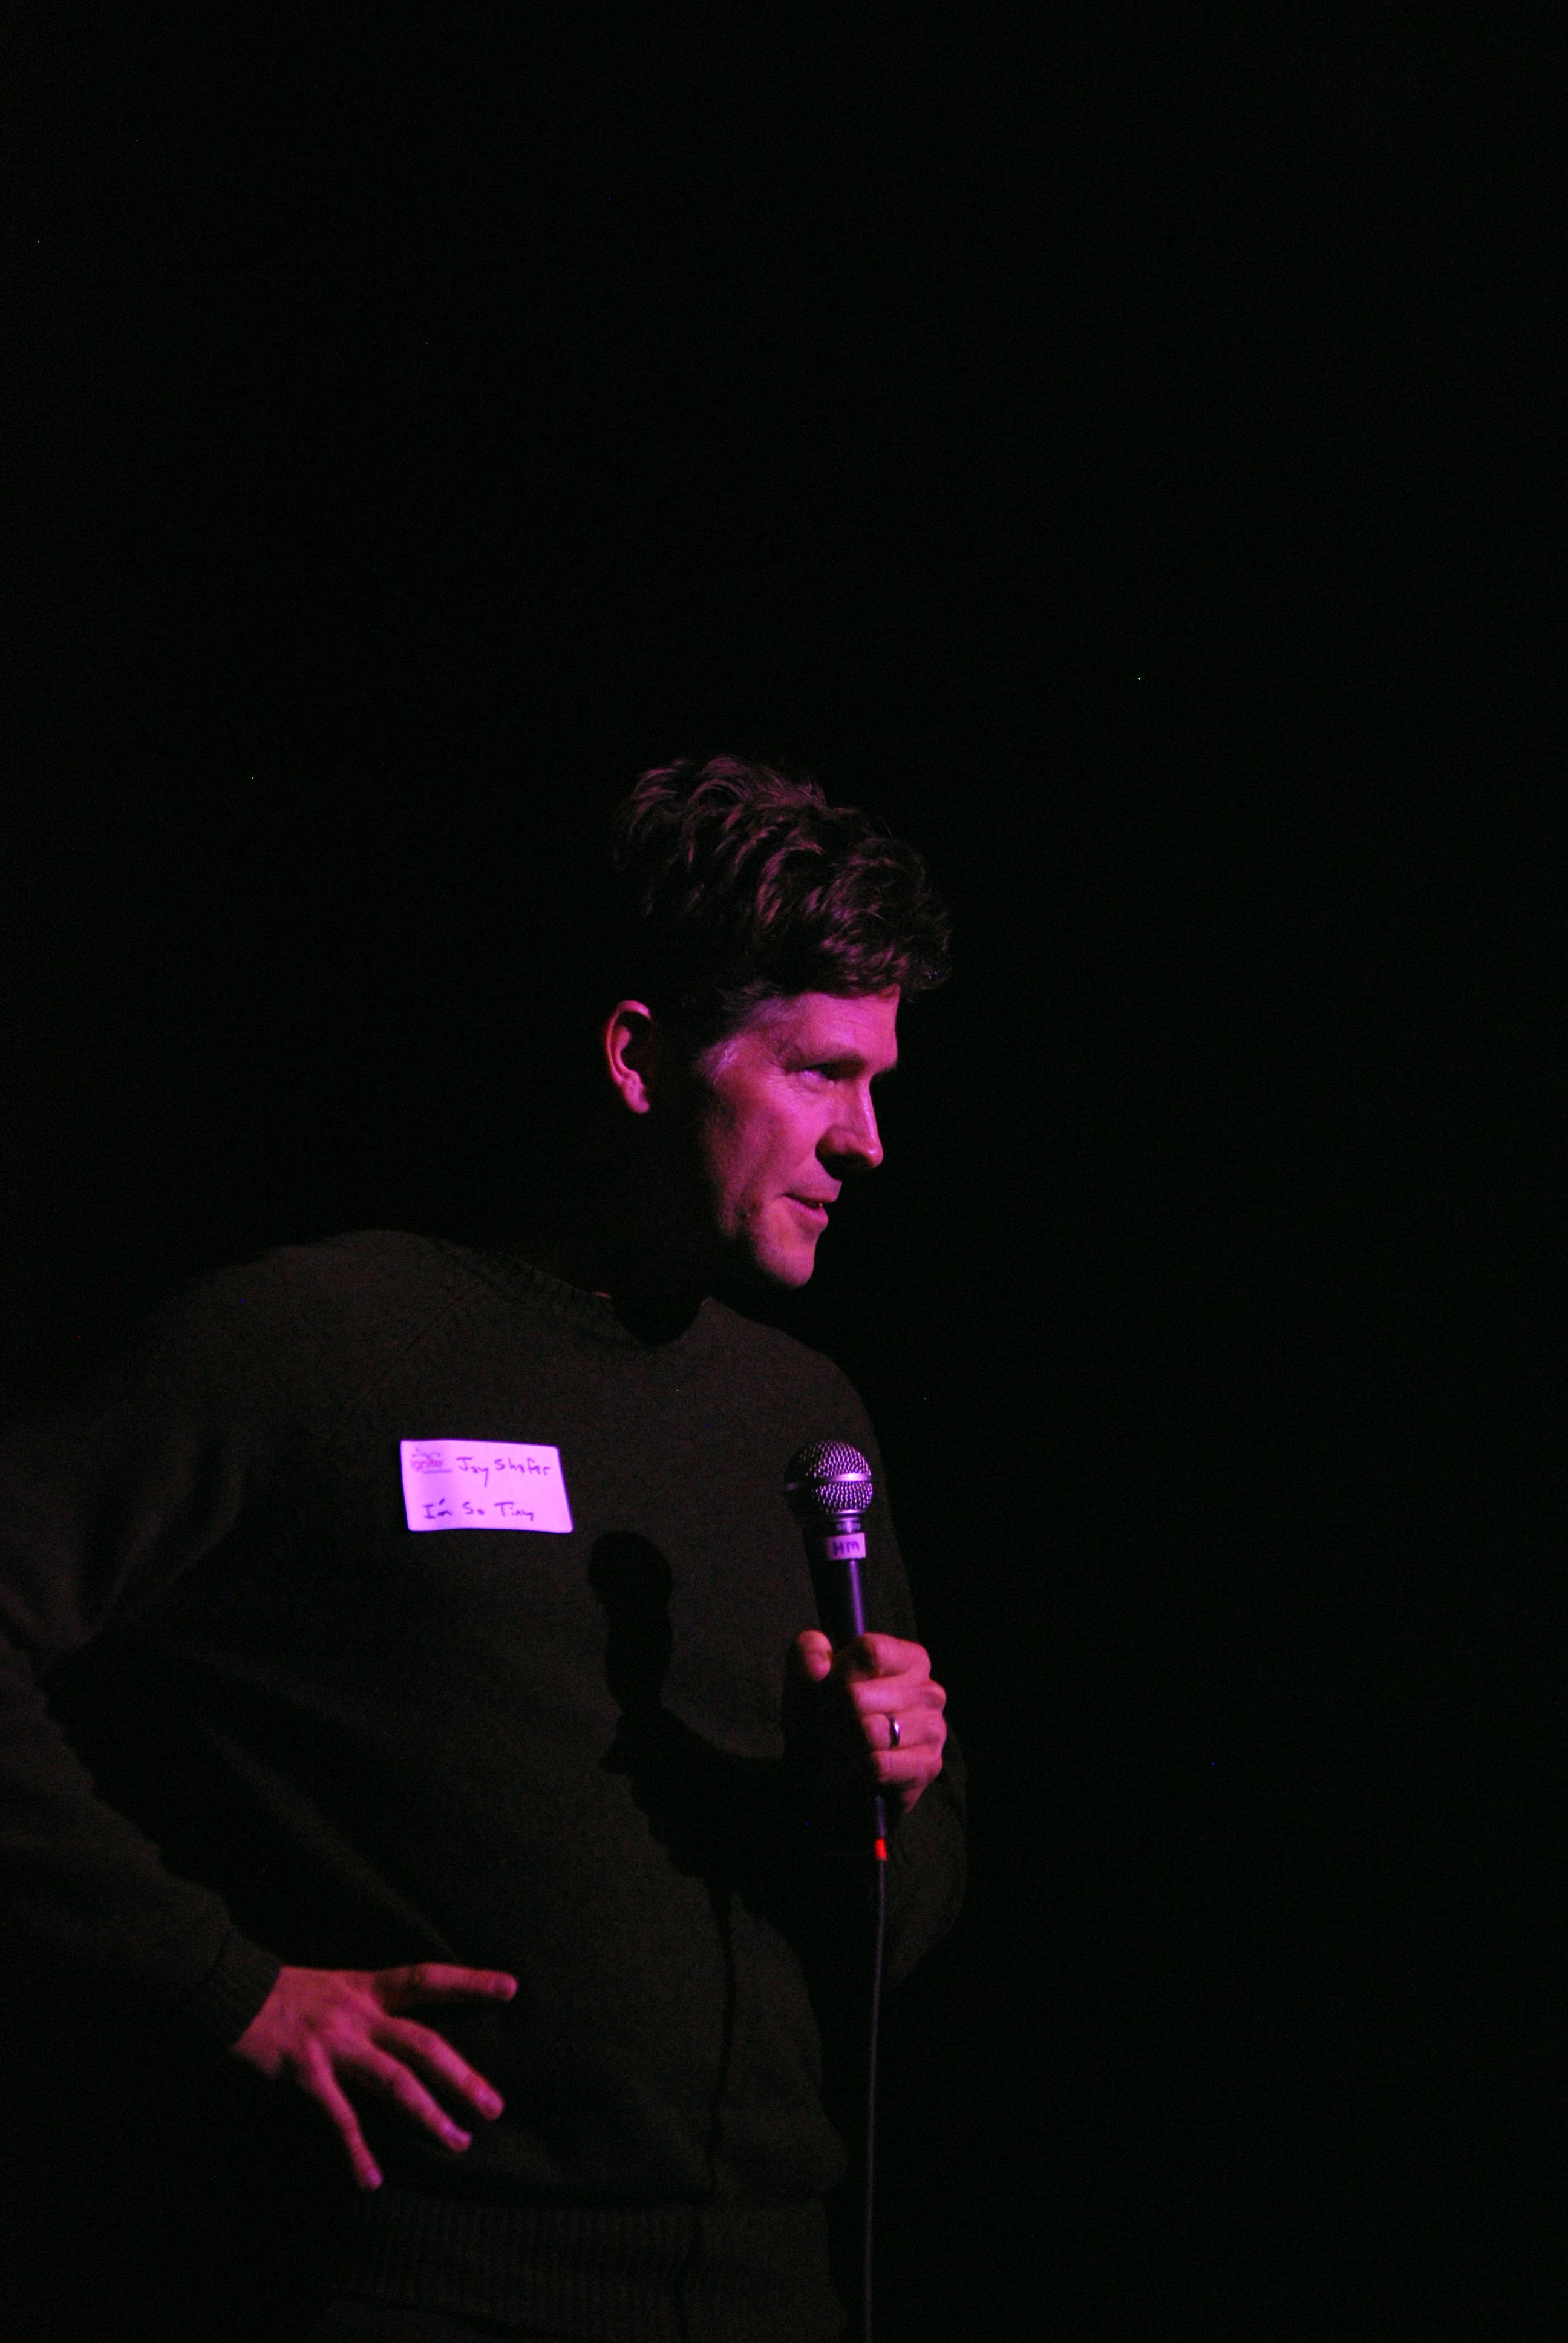 Jay Shafer Speaking About Tiny Houses at Ignite Sebastopol 3